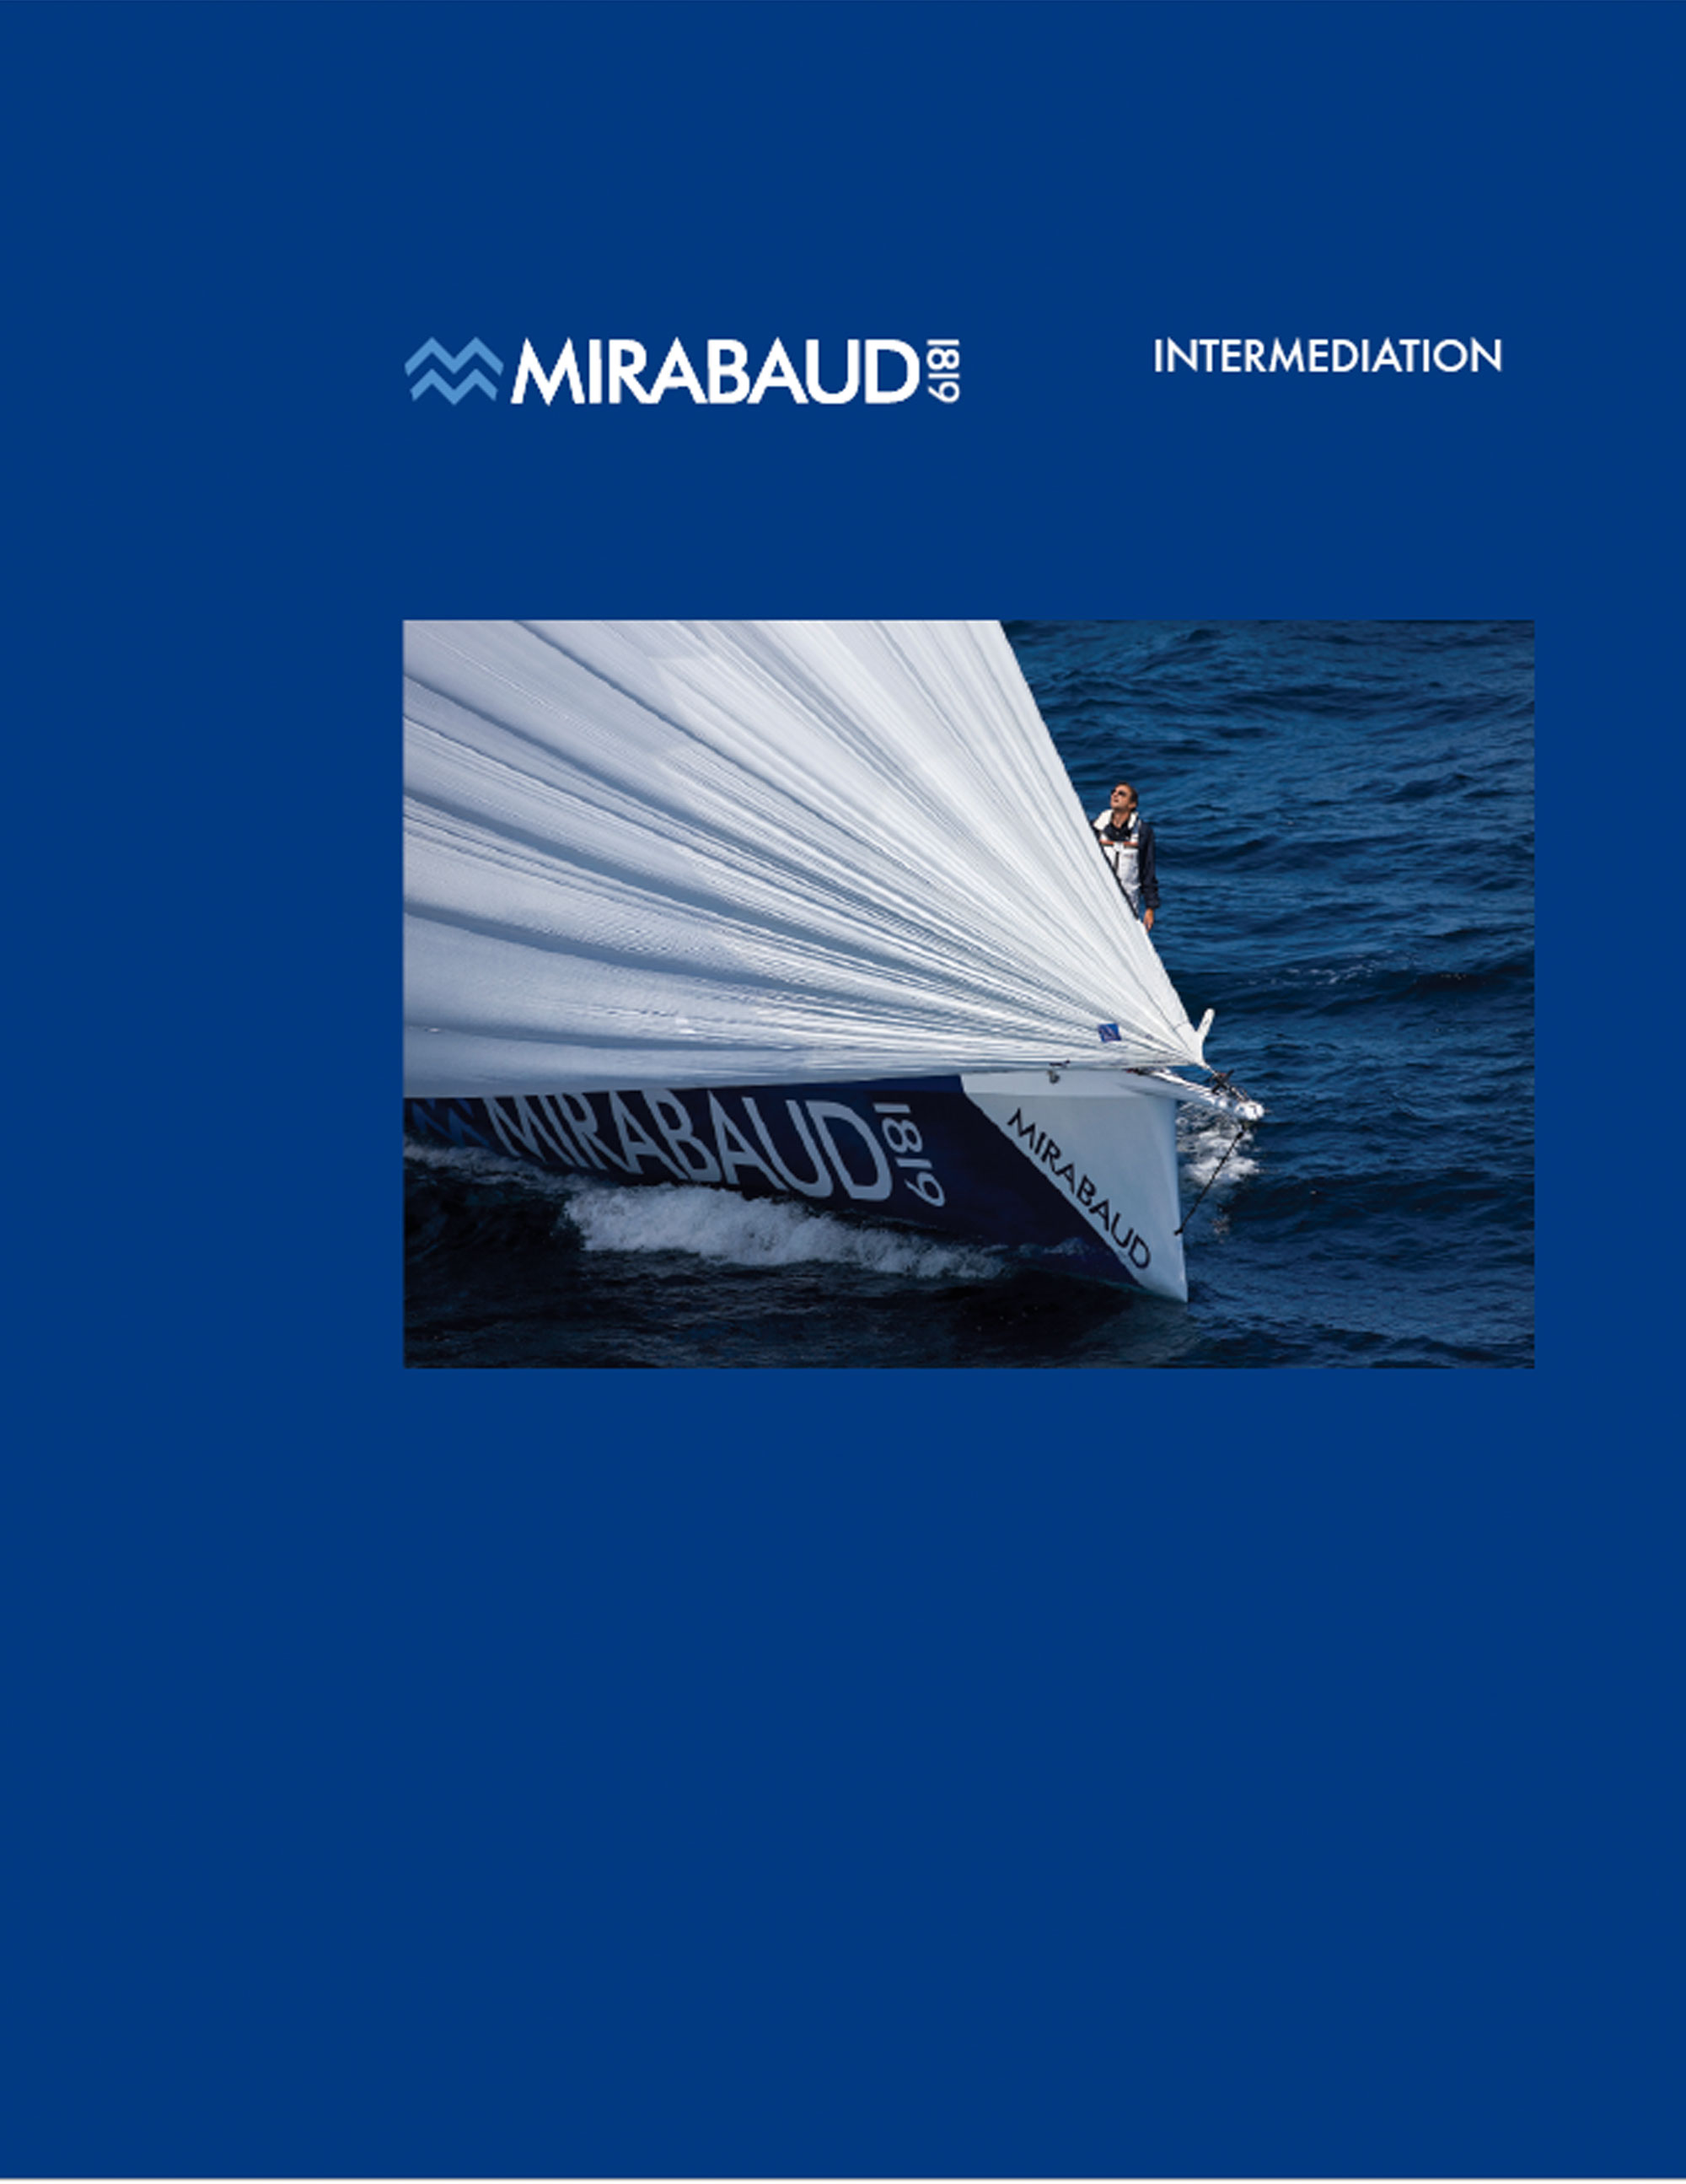 mirabaud_left